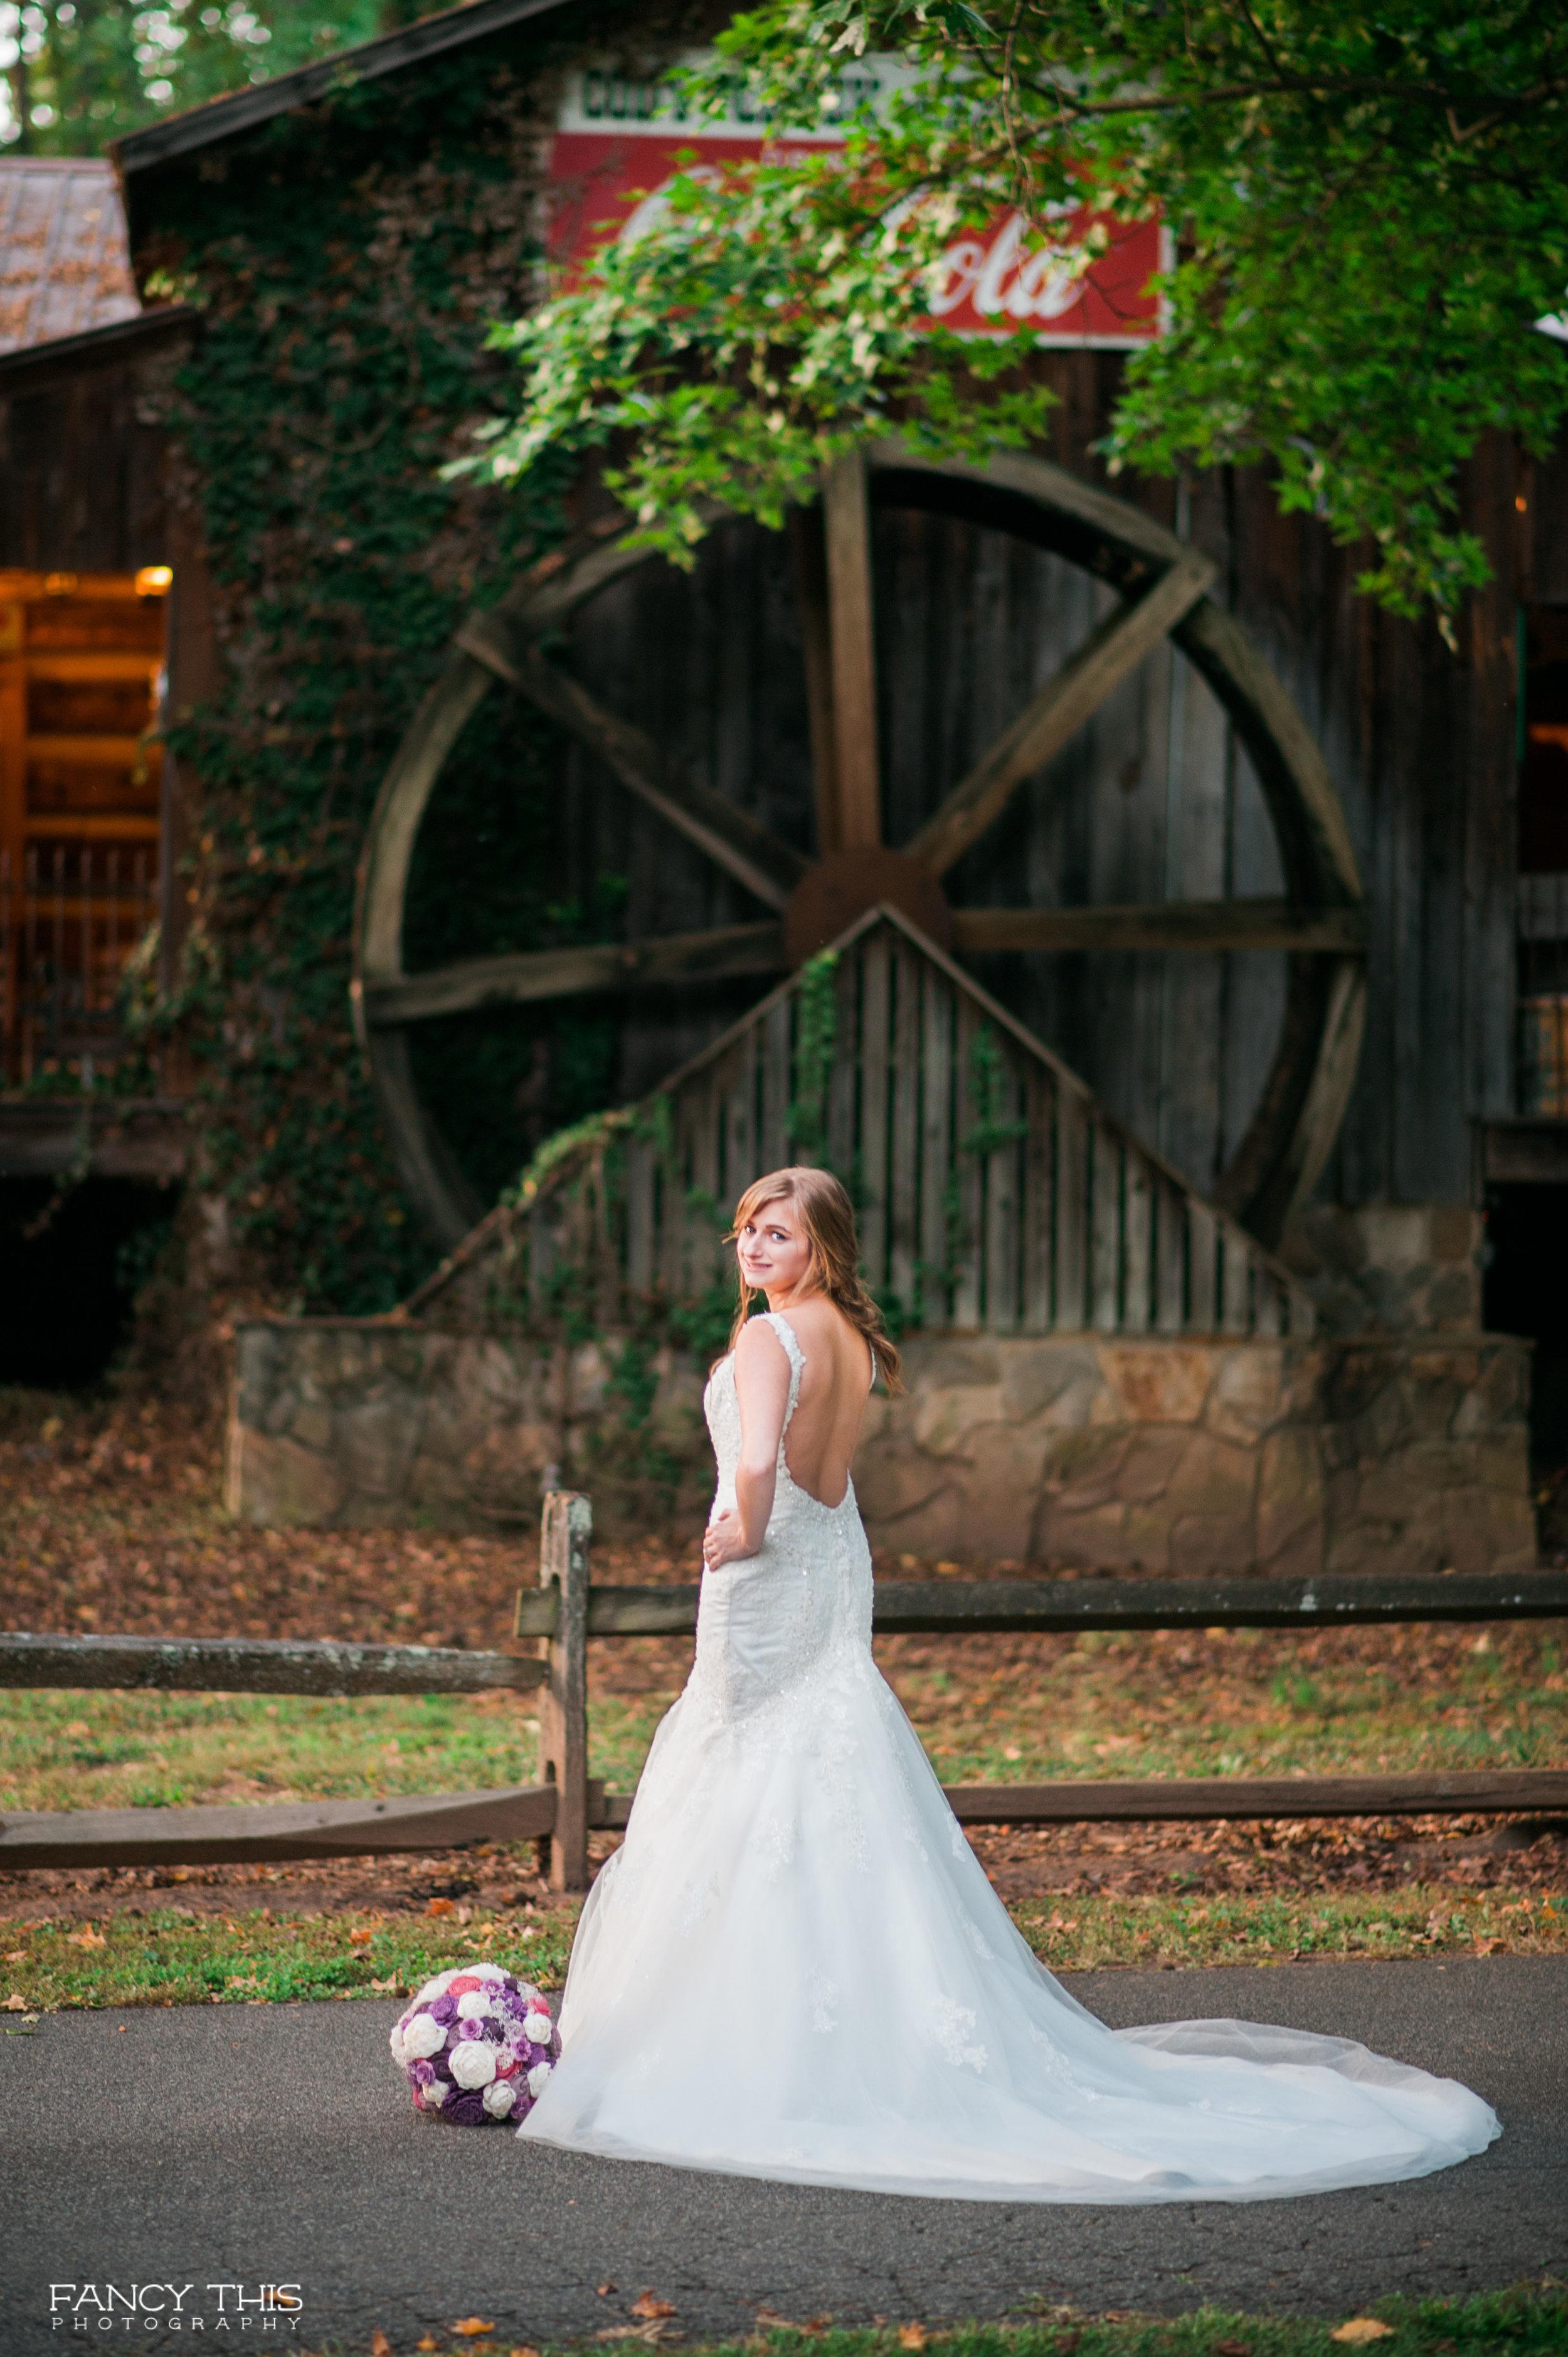 carolsimchik_bridals_socialmediaready-48.jpg